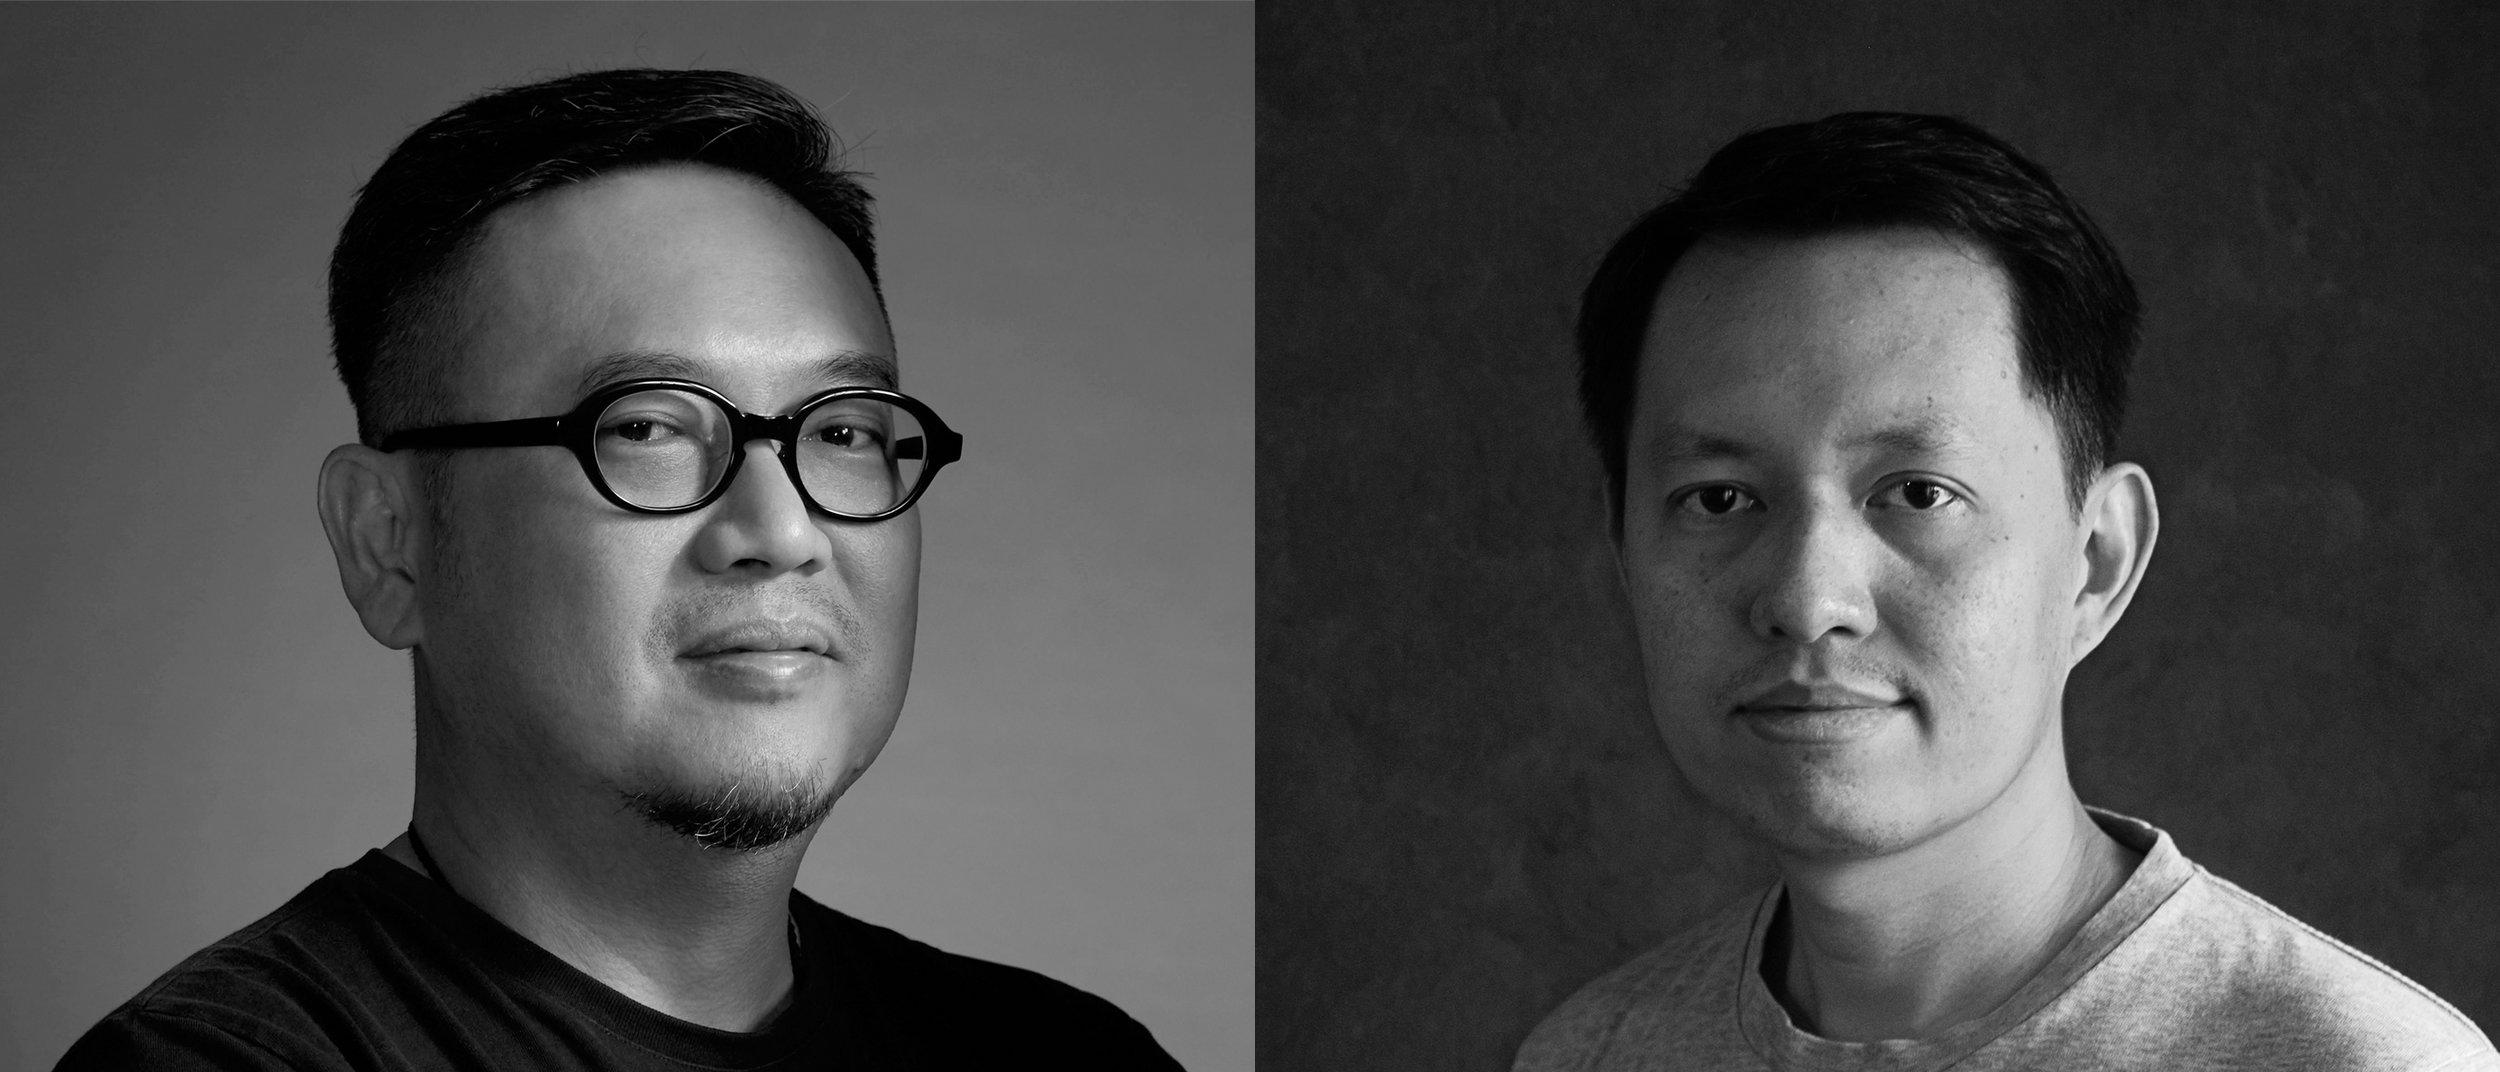 Woon Hoh  (left) - Chief Creative Officer  Nicholas Kosasih  (right) - Regional Associate Creative Director